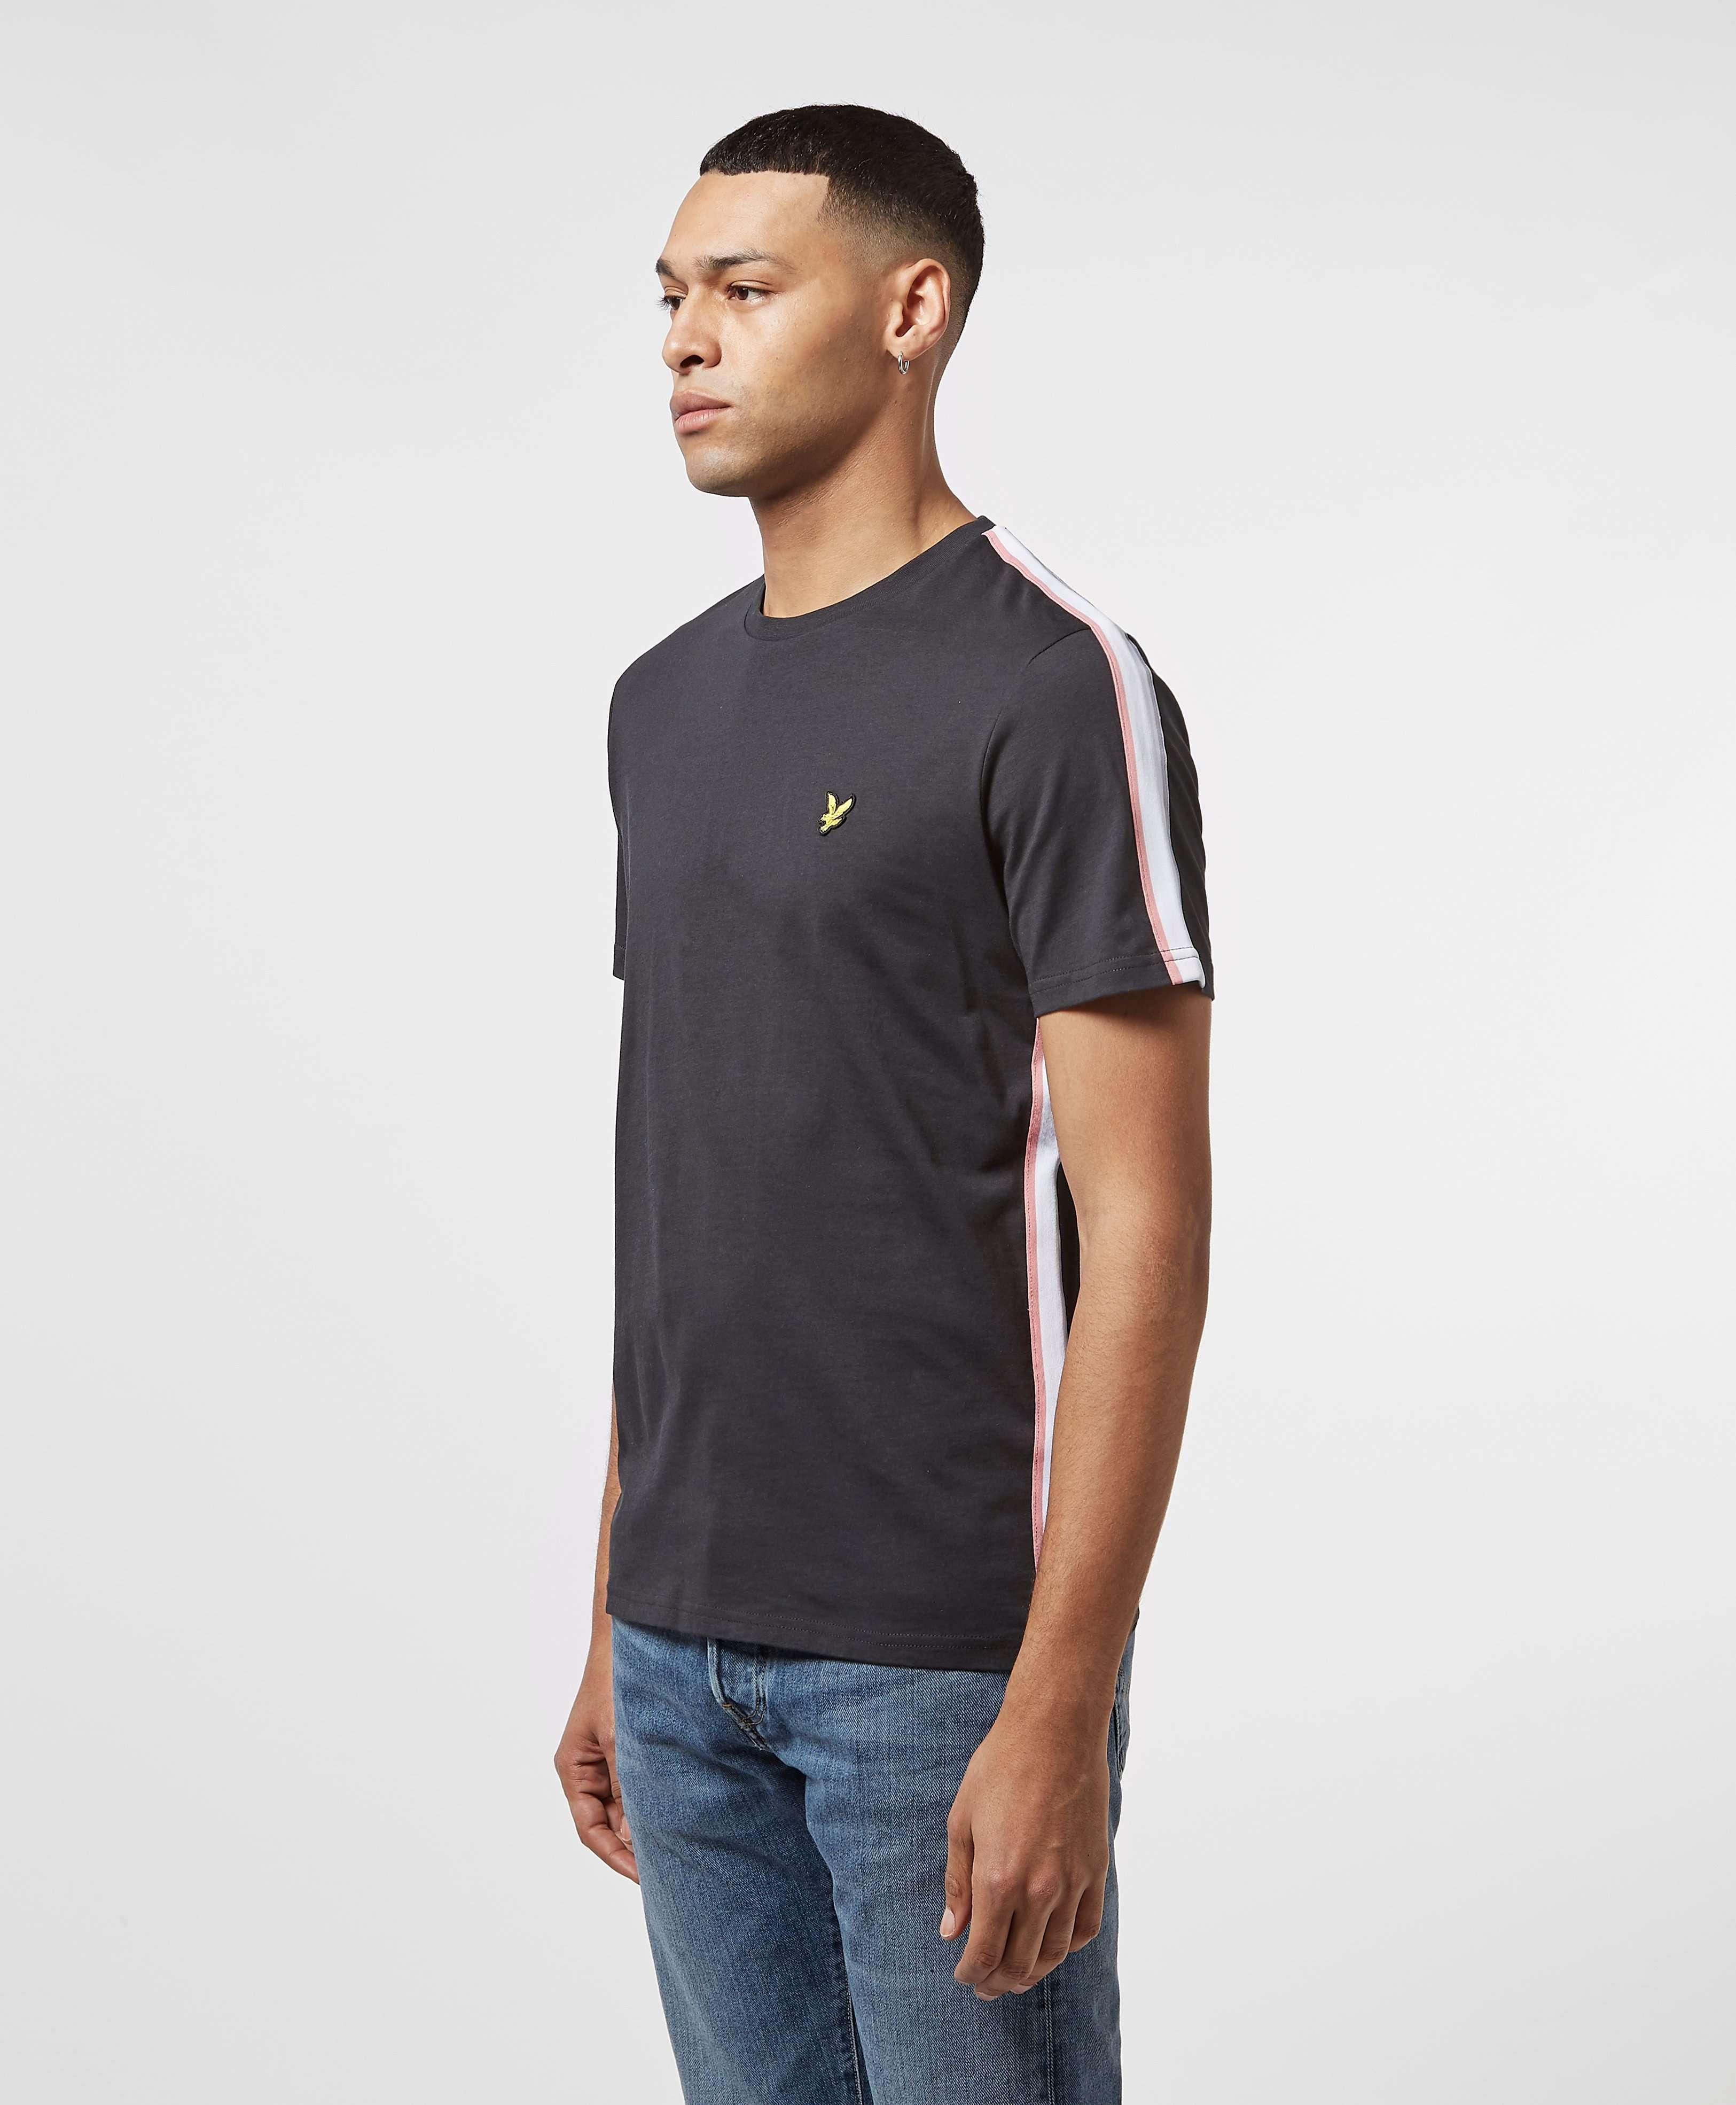 Lyle & Scott Short Sleeve Tape T-Shirt - Online Exclusive